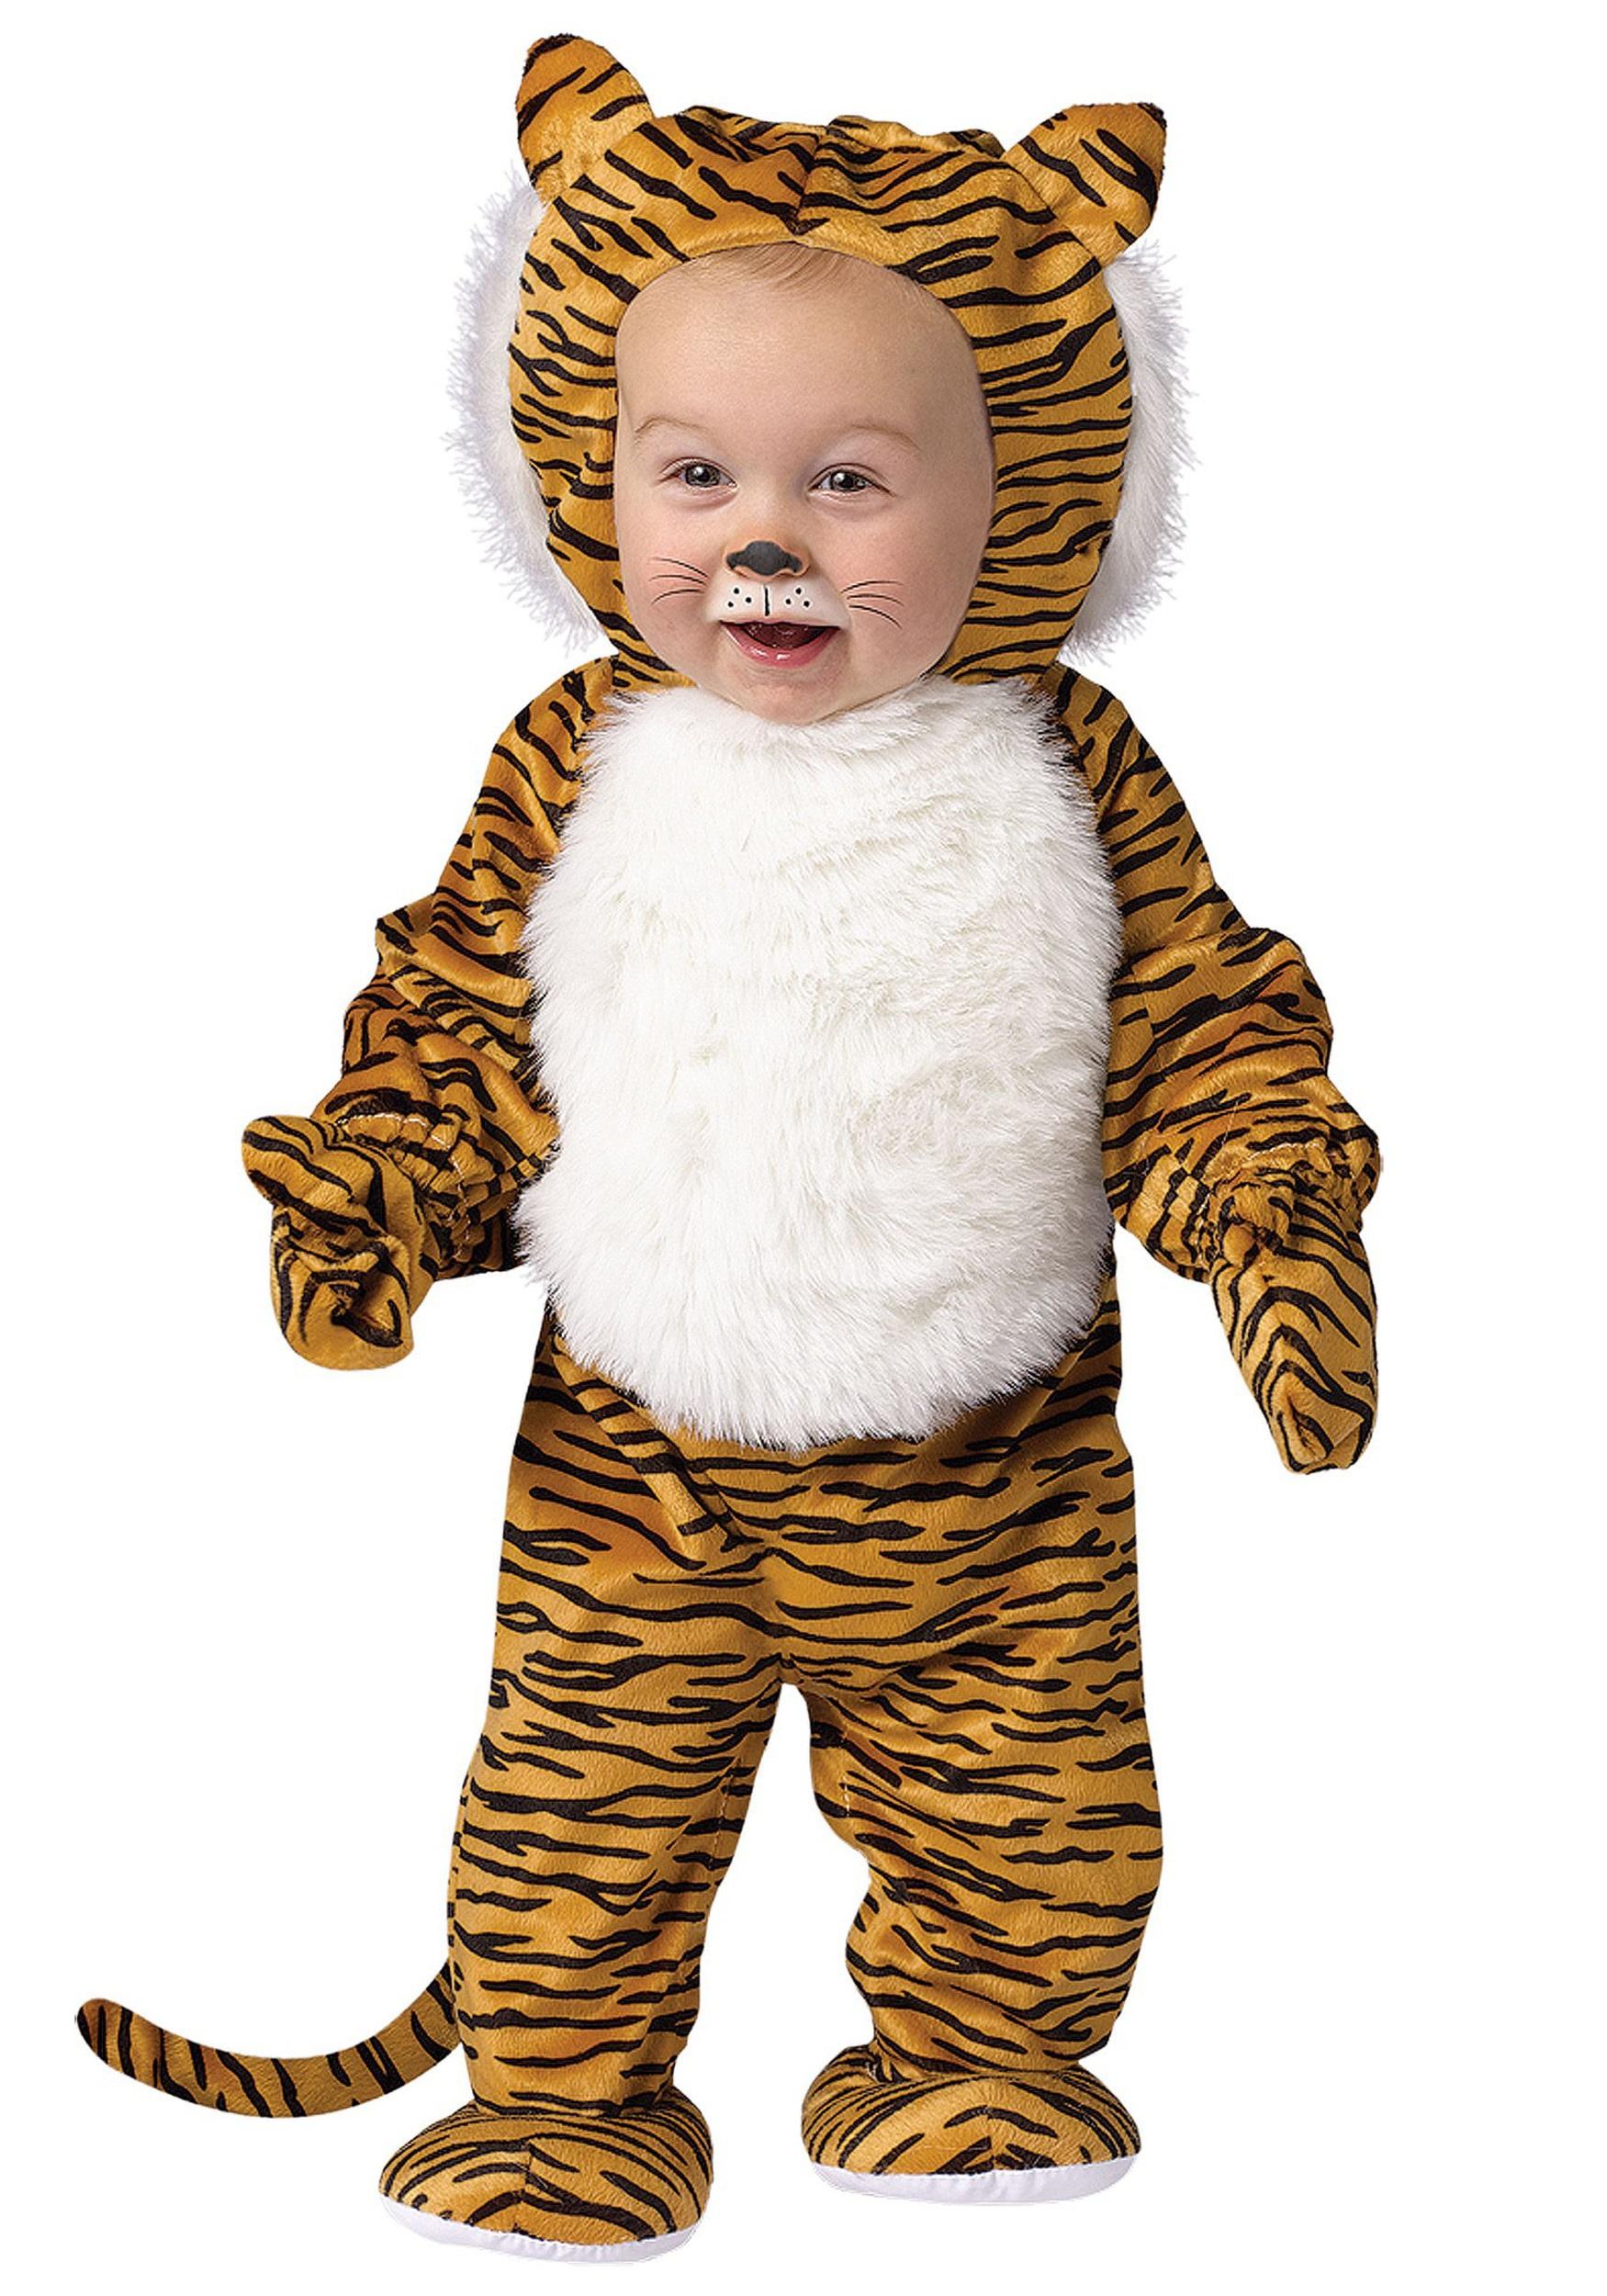 Toddler Cuddly Tiger Costume  sc 1 st  Halloween Costumes & Toddler Cuddly Tiger Costume - Halloween Costumes